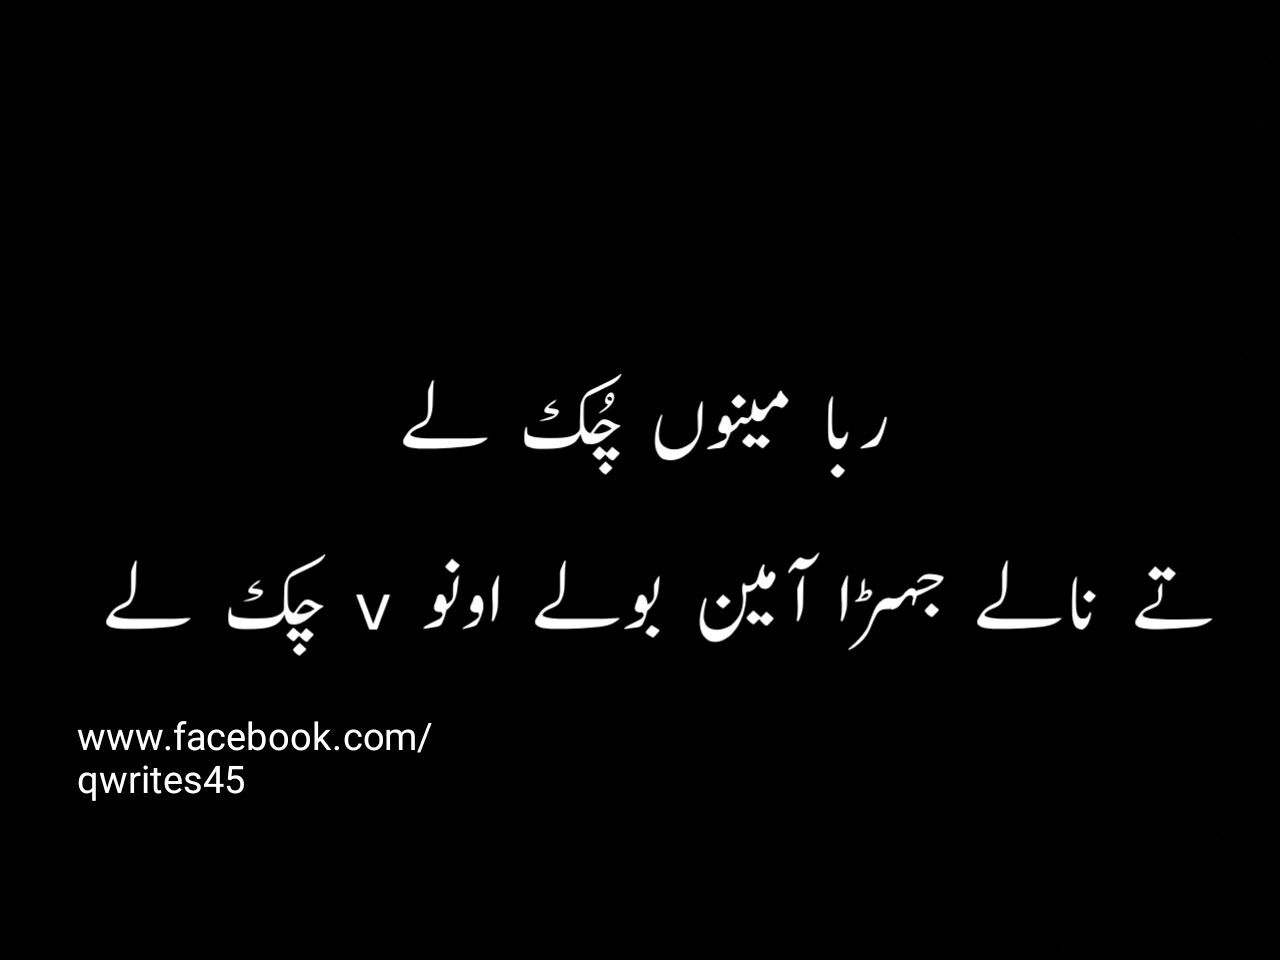 Q Jokea Urdu Jokes Mazahiya Lateefay Urdu Funny Quotes Funny Whatsapp Status Funny Words